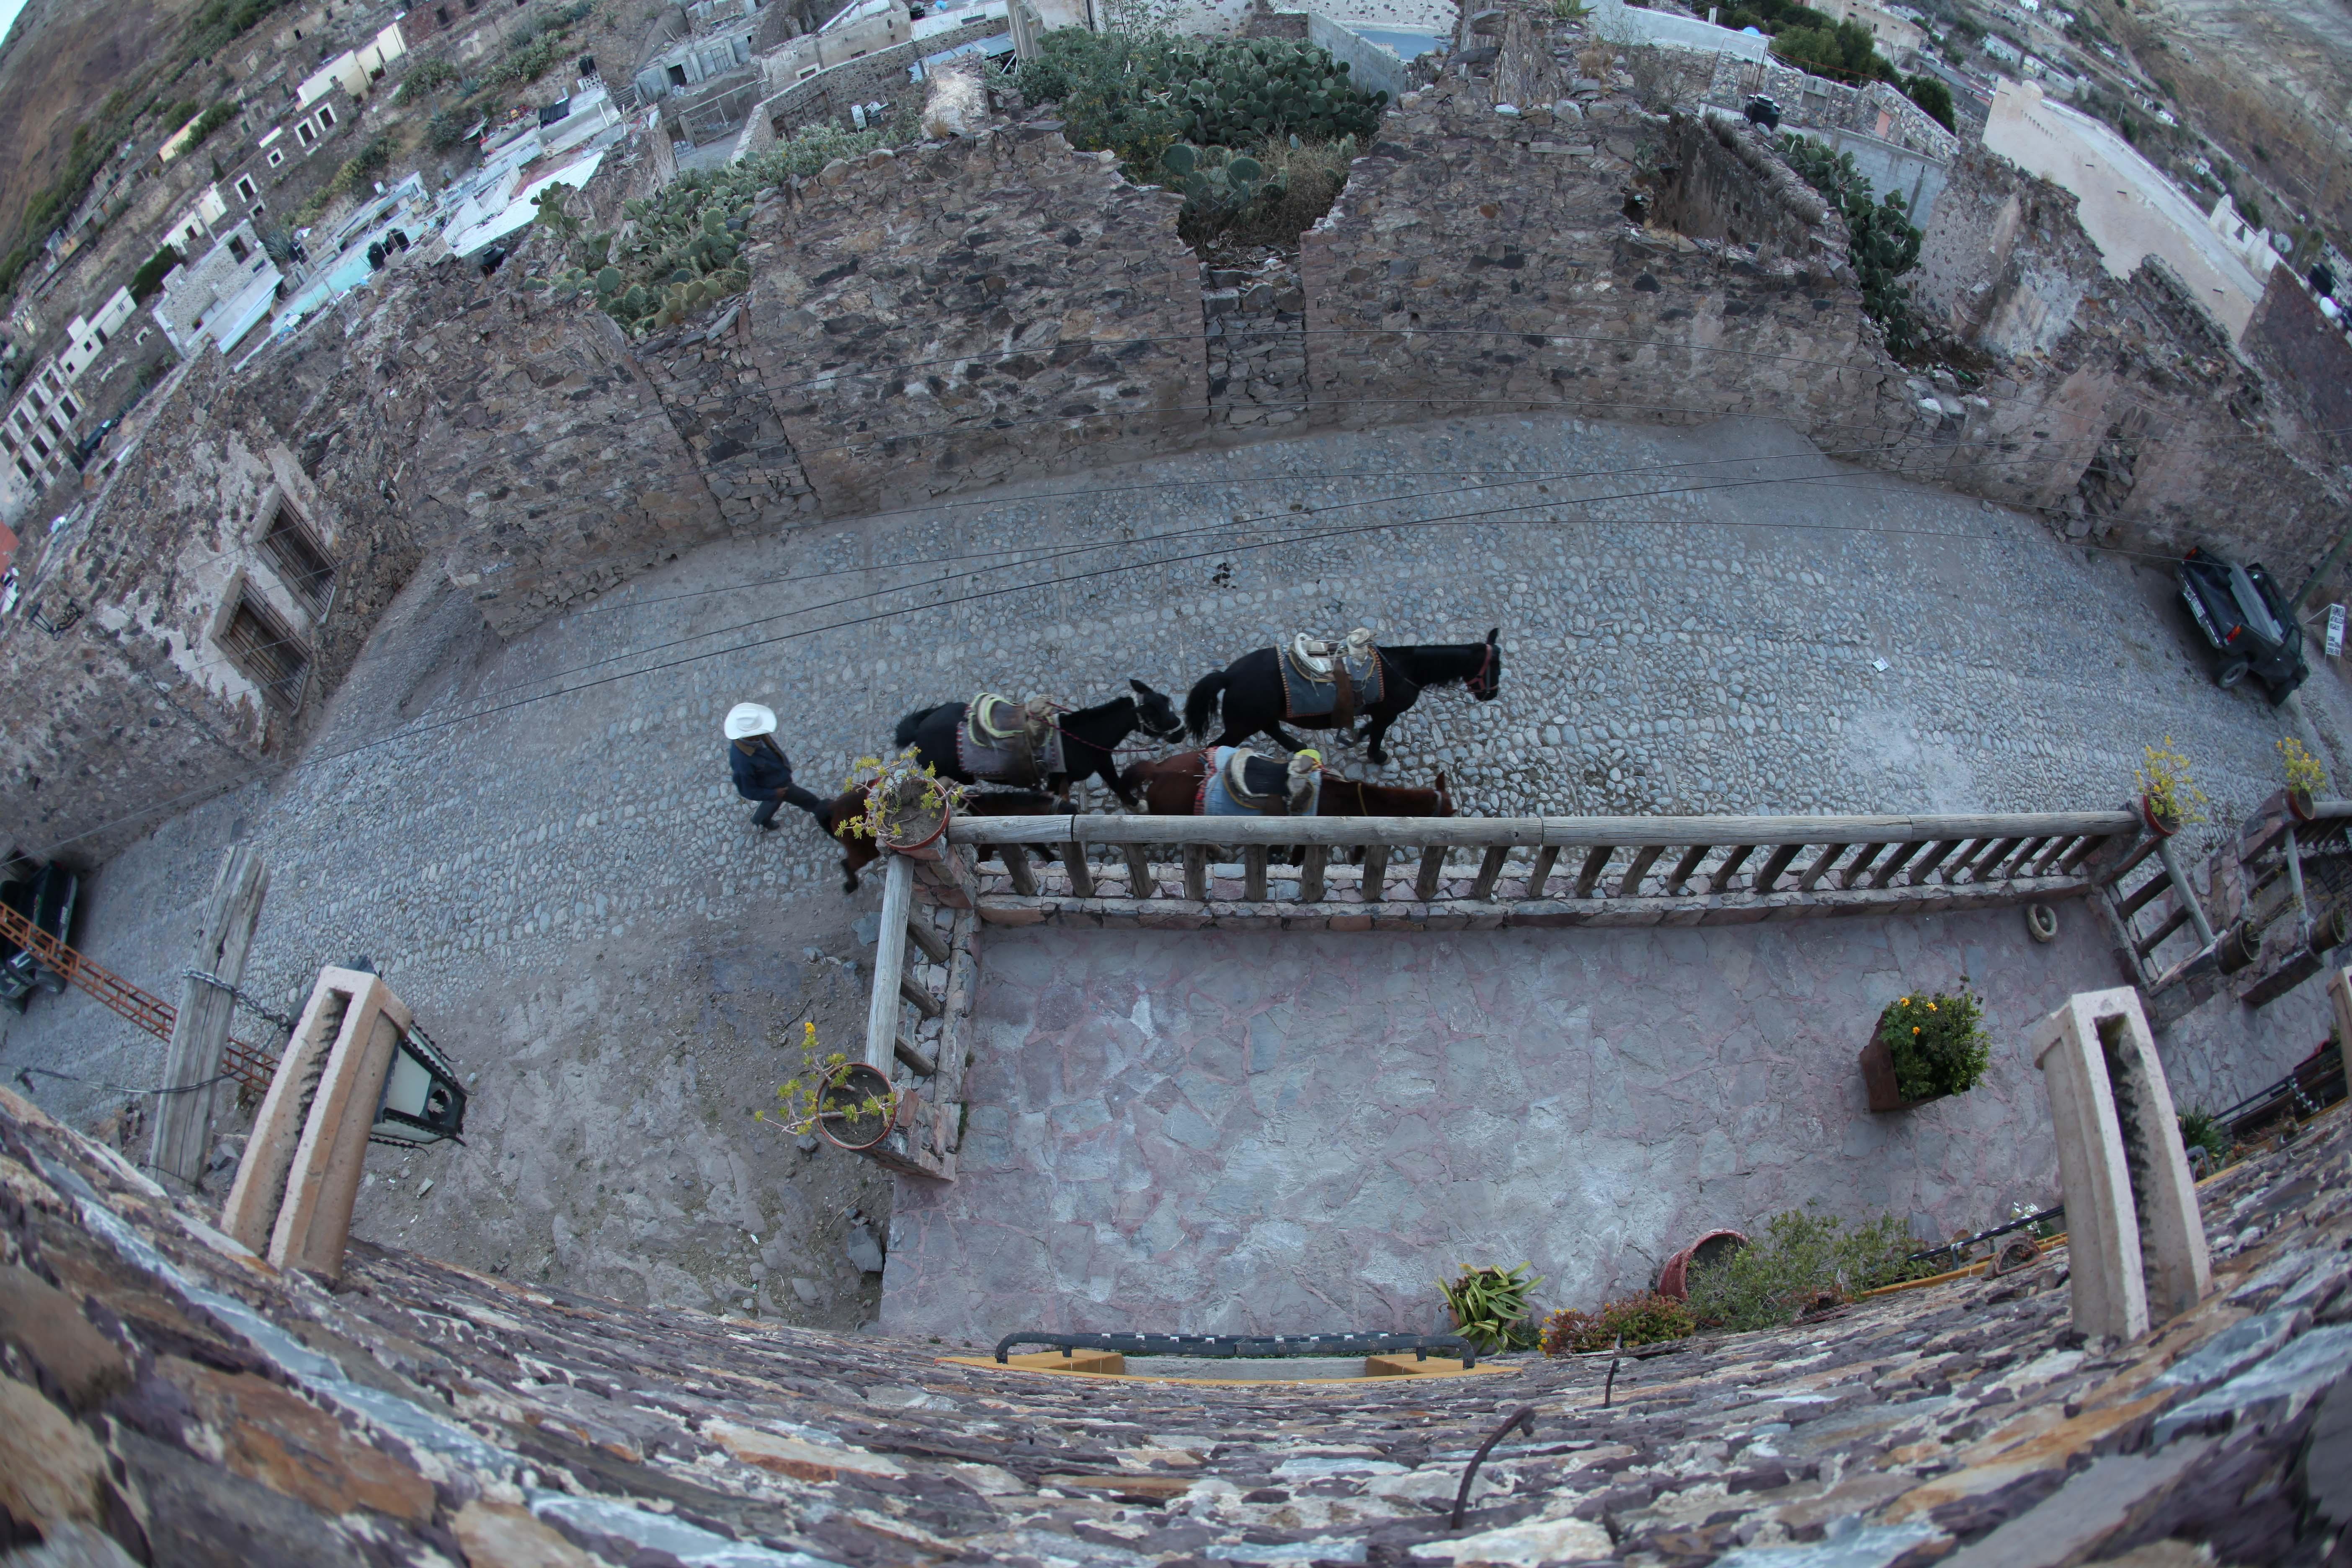 10 imperdibles de Real de Catorce minas